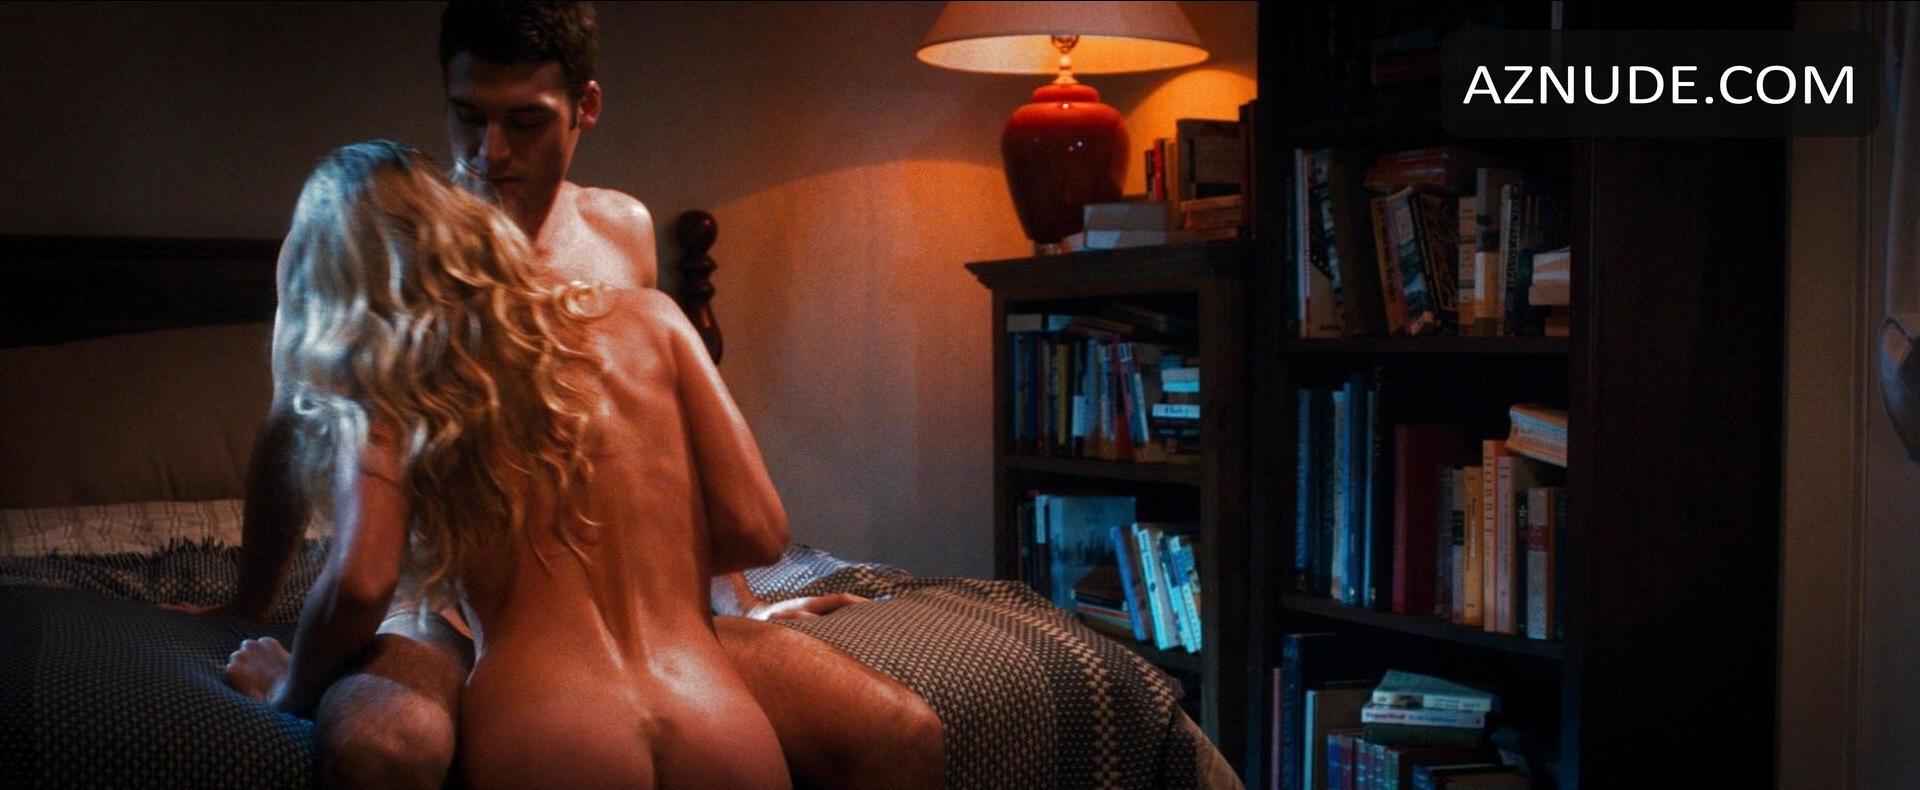 Jennifer lopez sex scene the boy next door - 2 part 5